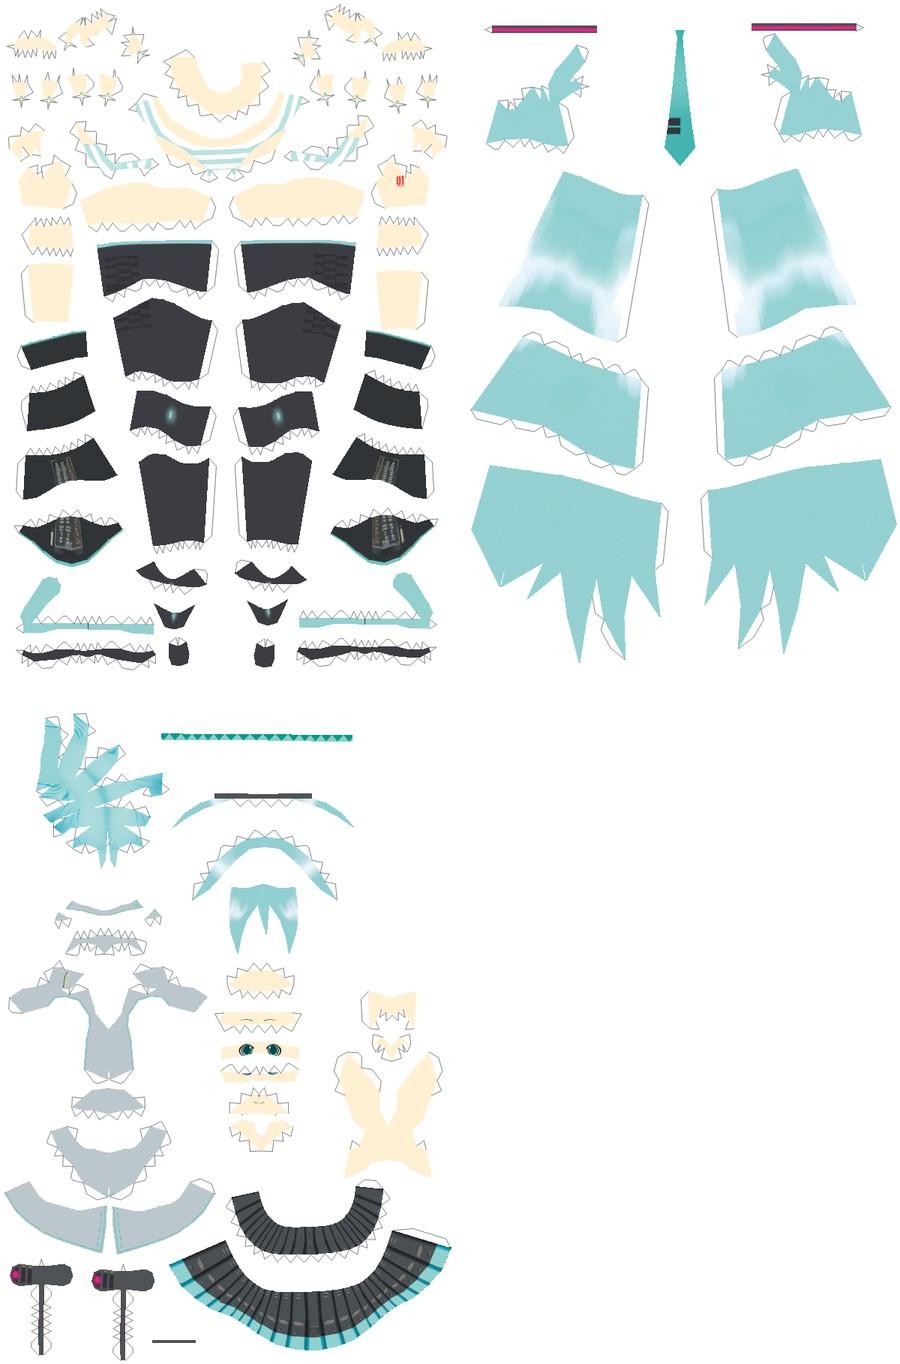 Printable Miku Hatsune Papercraft